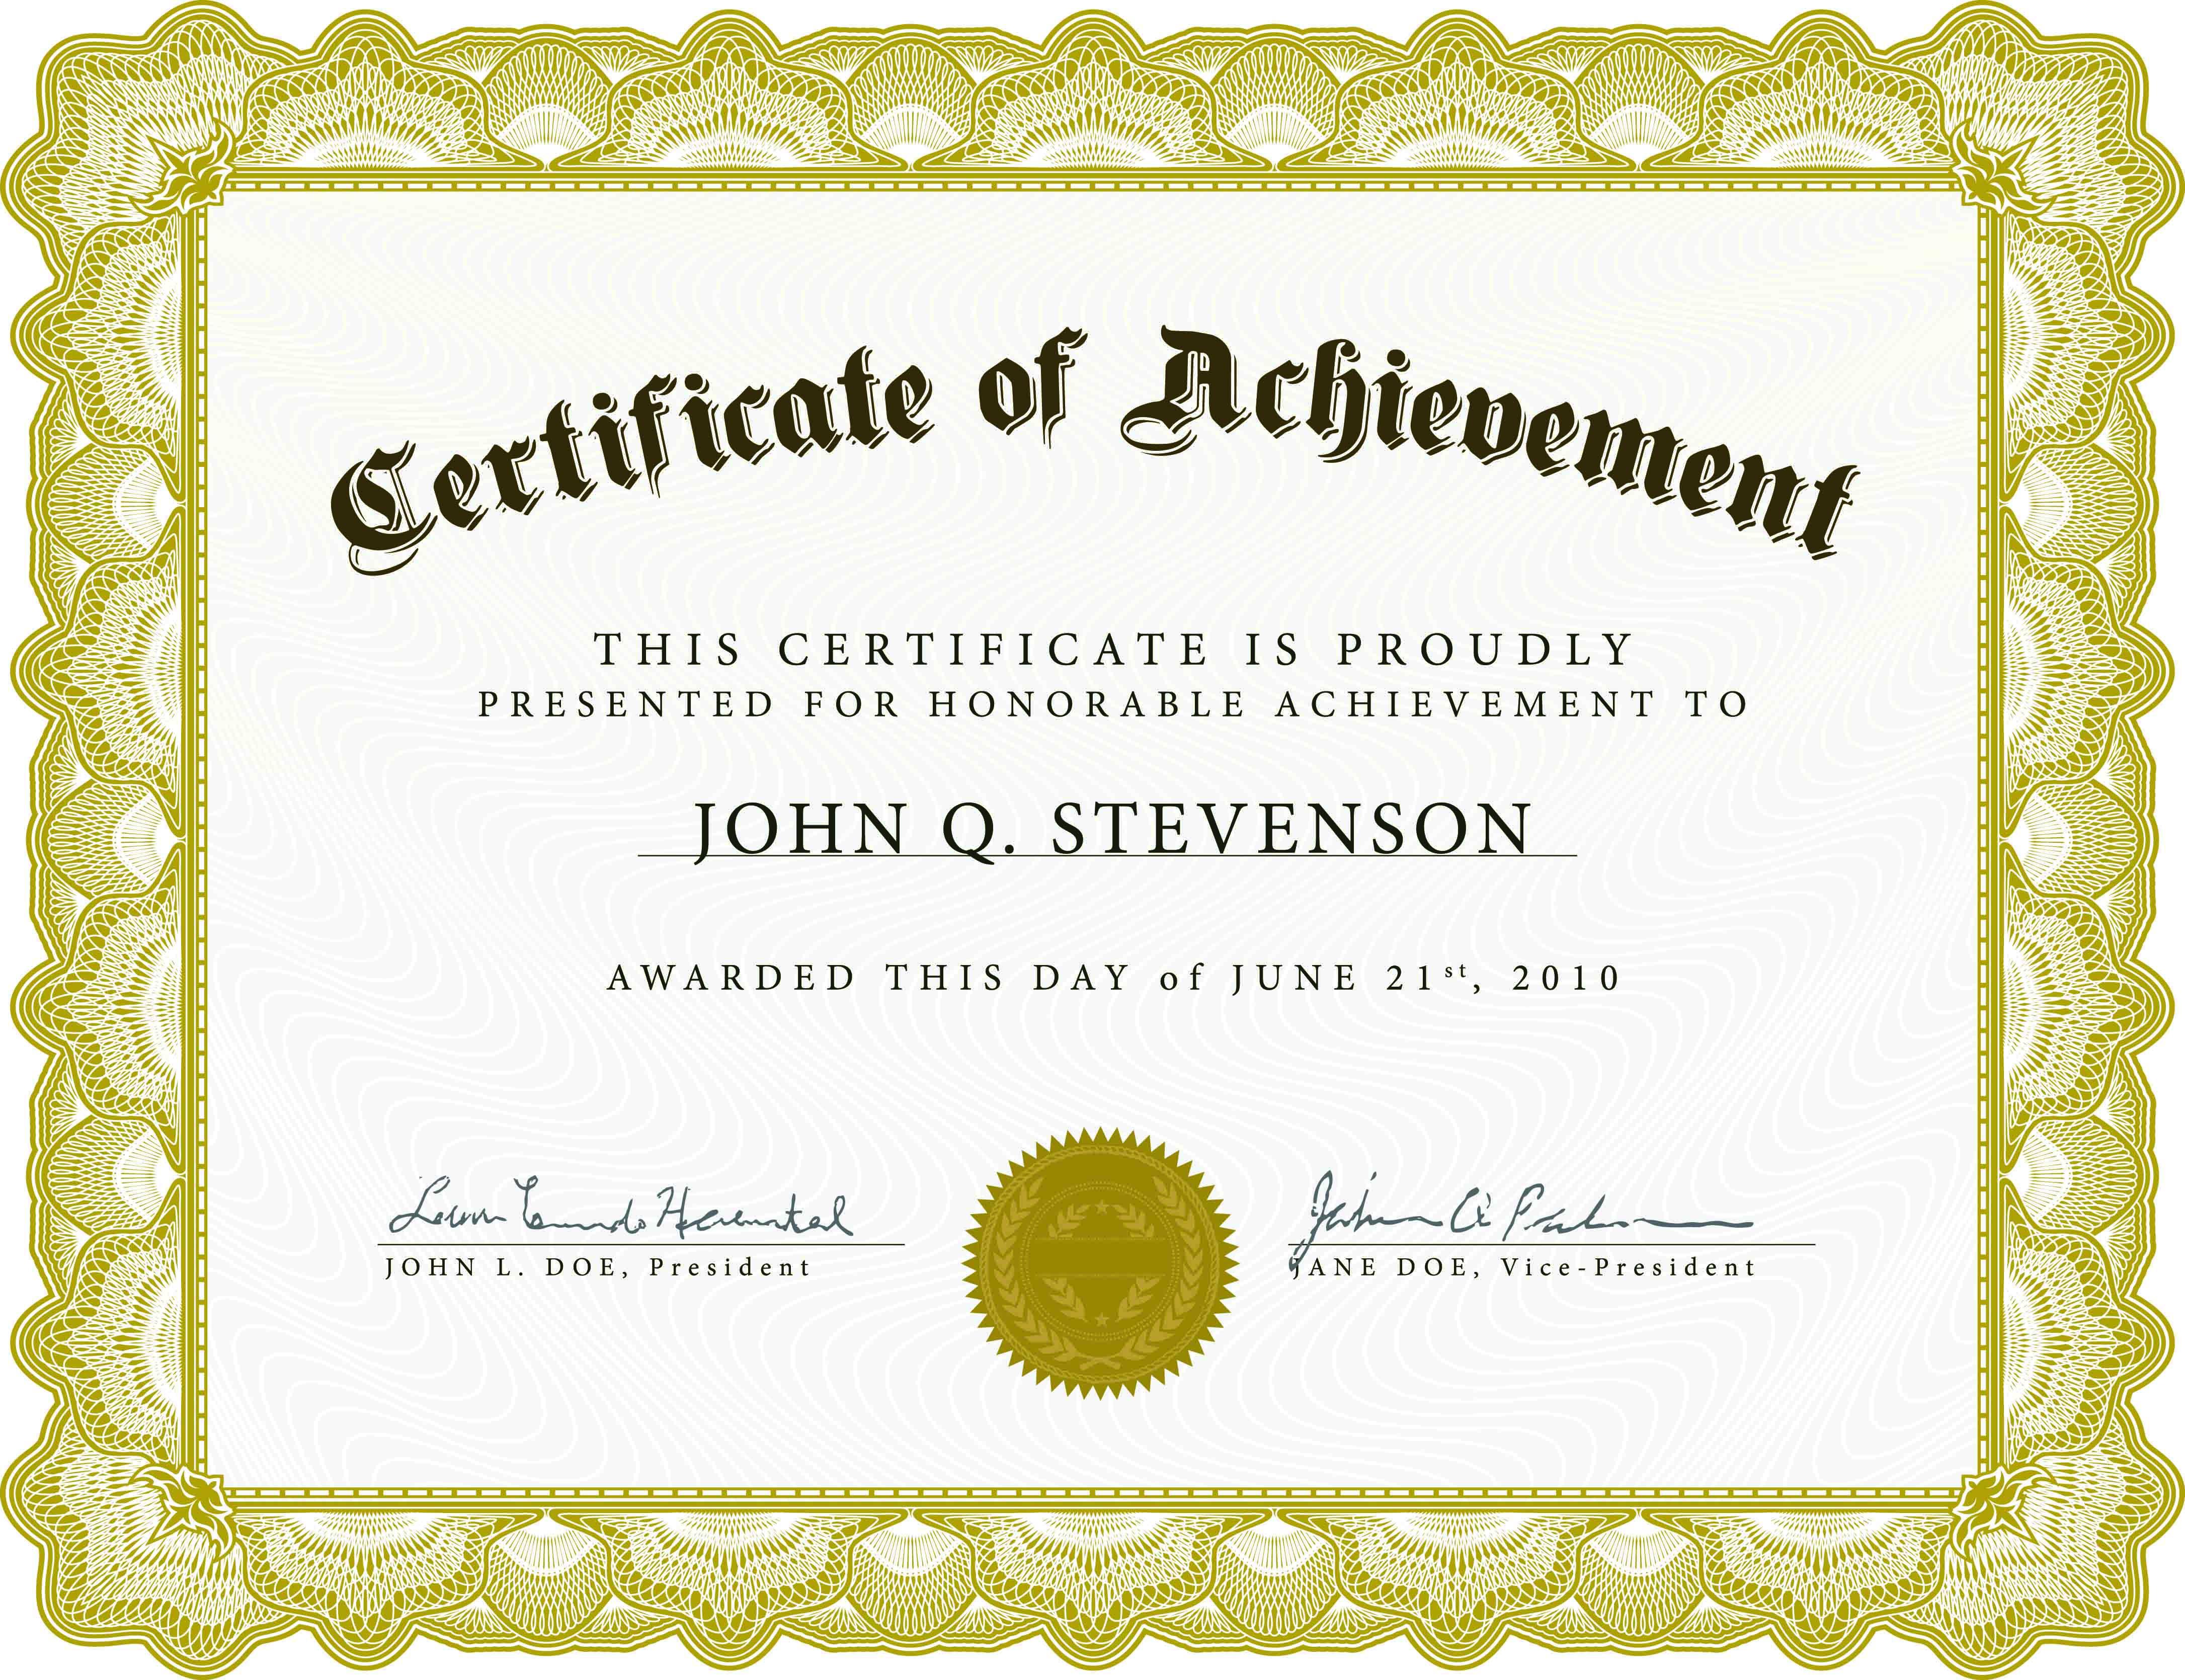 Achieve-Awards-Printable-Certificates - Free Printable Certificates And Awards